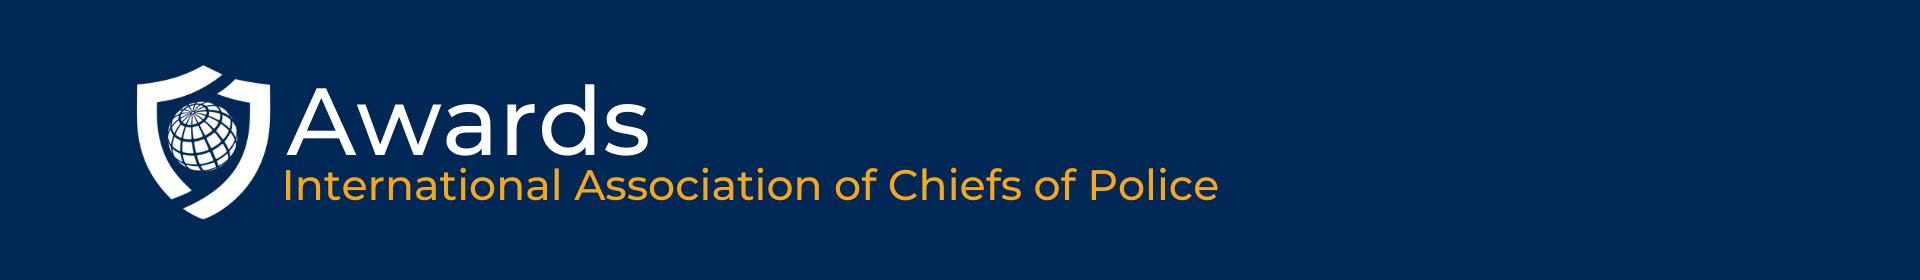 IACP 2021 Leadership Awards Event Banner